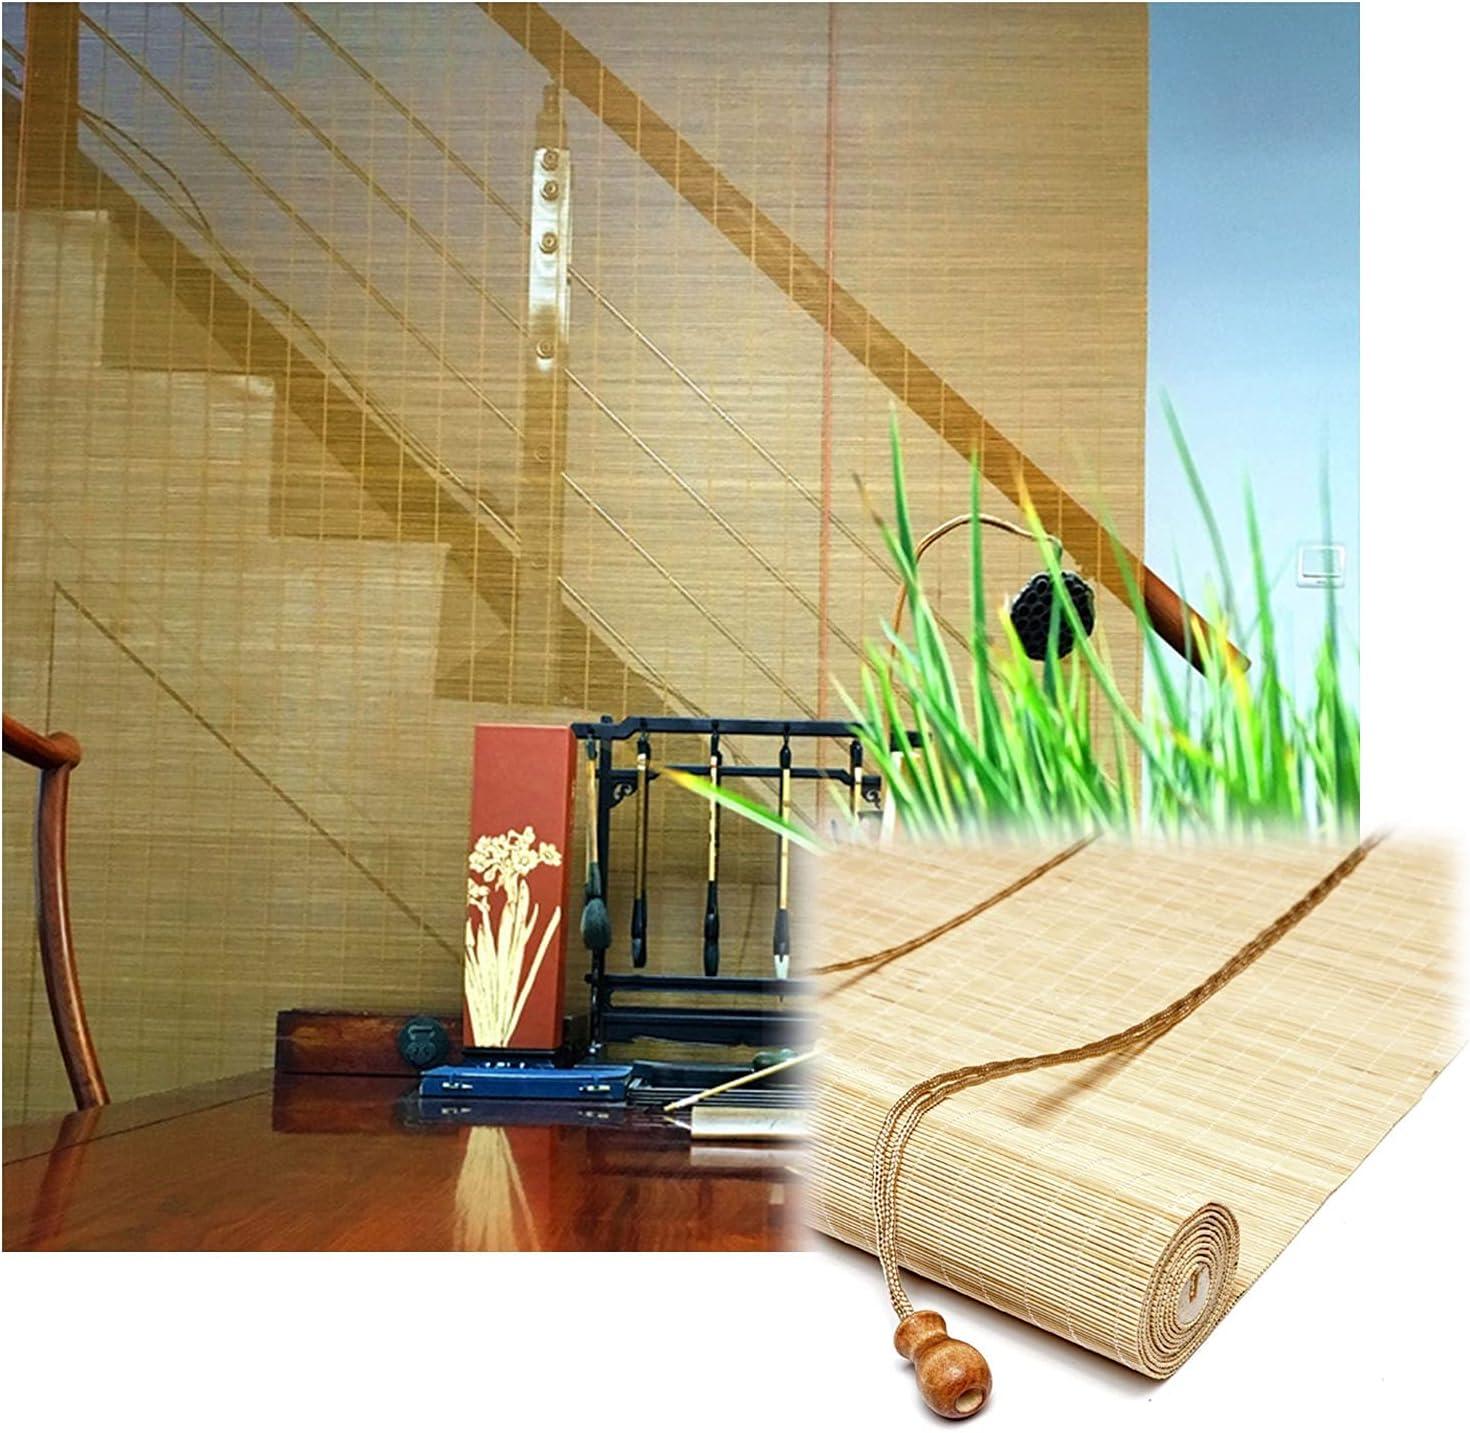 JUANJUAN Bamboo Roller Shade Large-scale sale Wood Darkening Direct sale of manufacturer Color Room Curtain